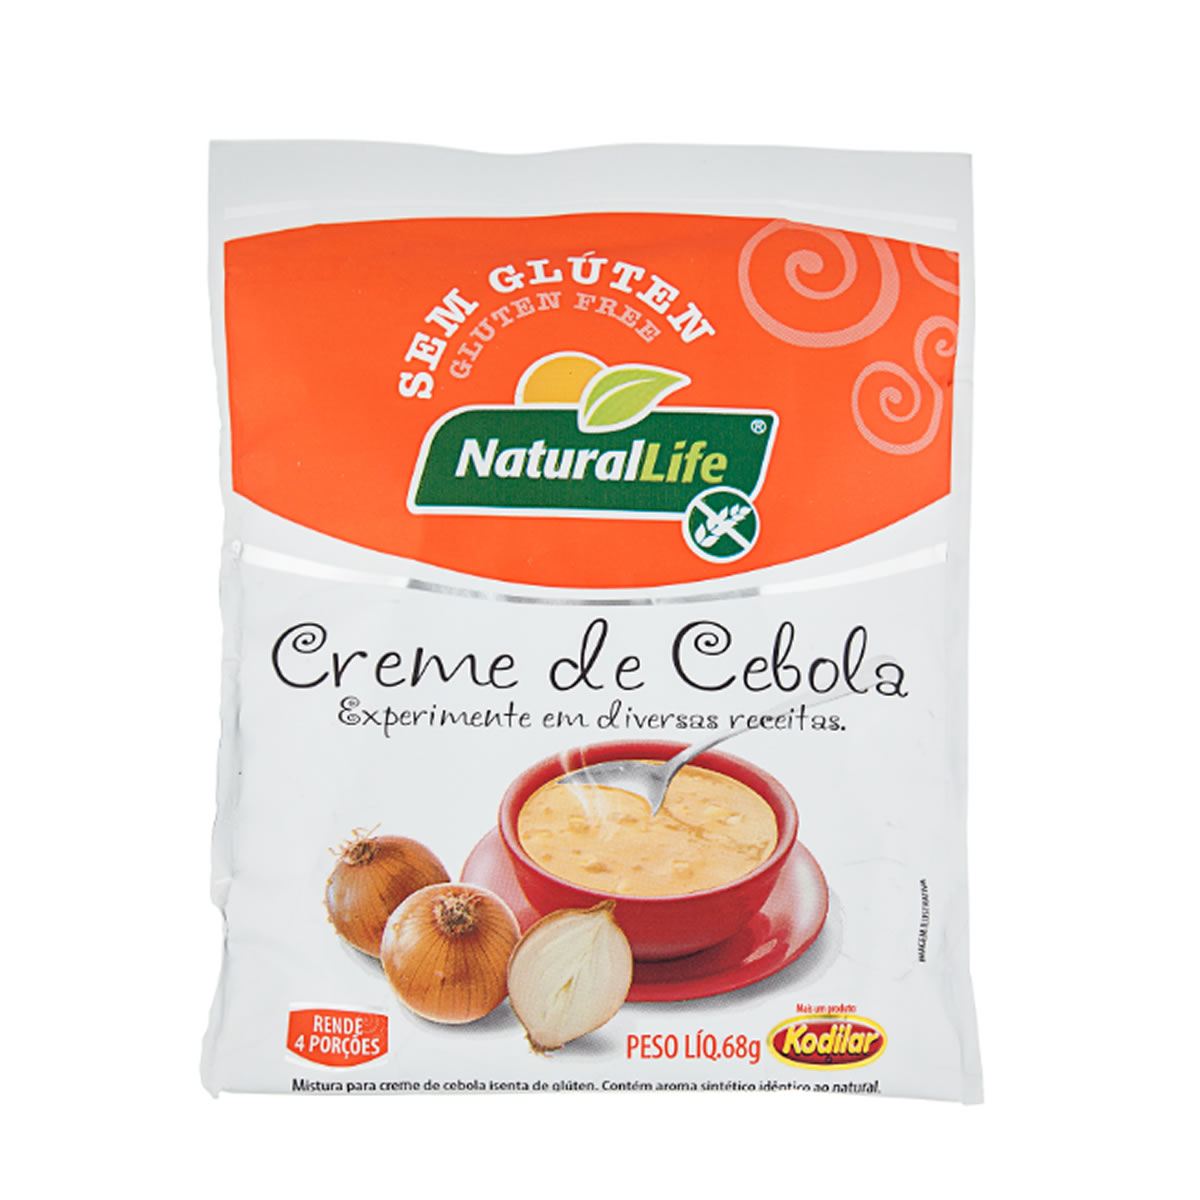 Creme de Cebola Sem Glúten 68g - NaturalLife